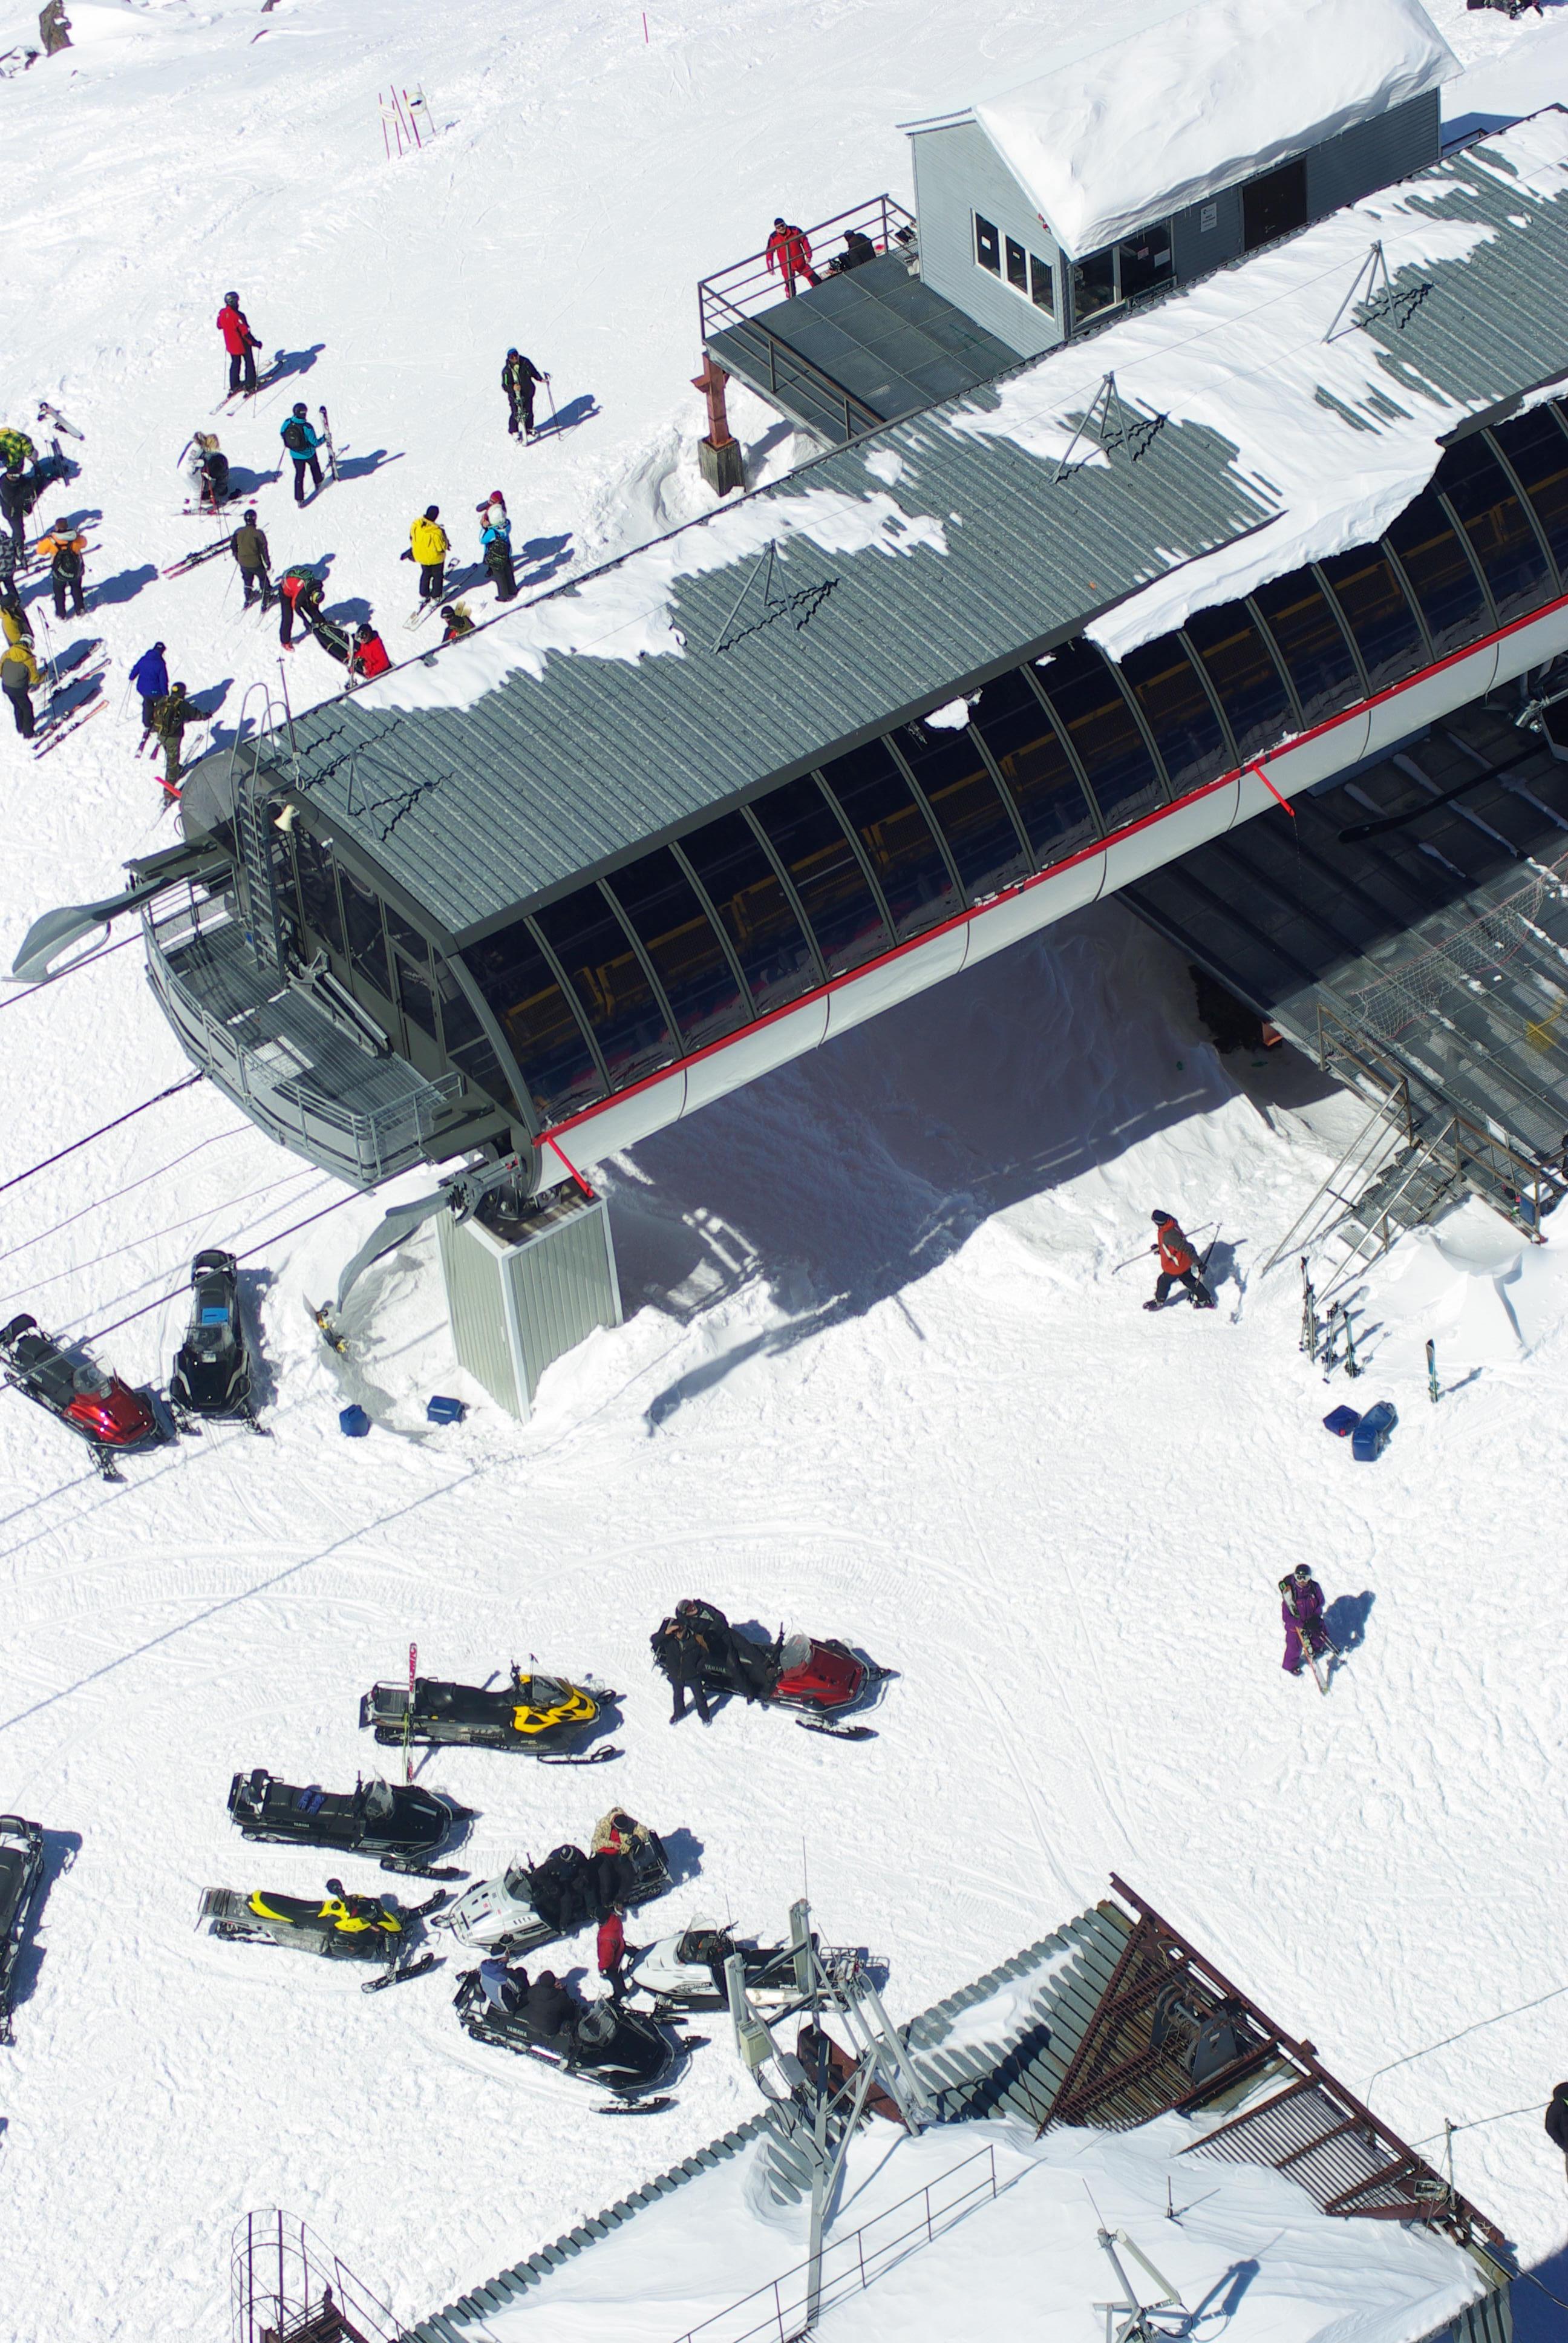 mir 3500, Mt Elbrus